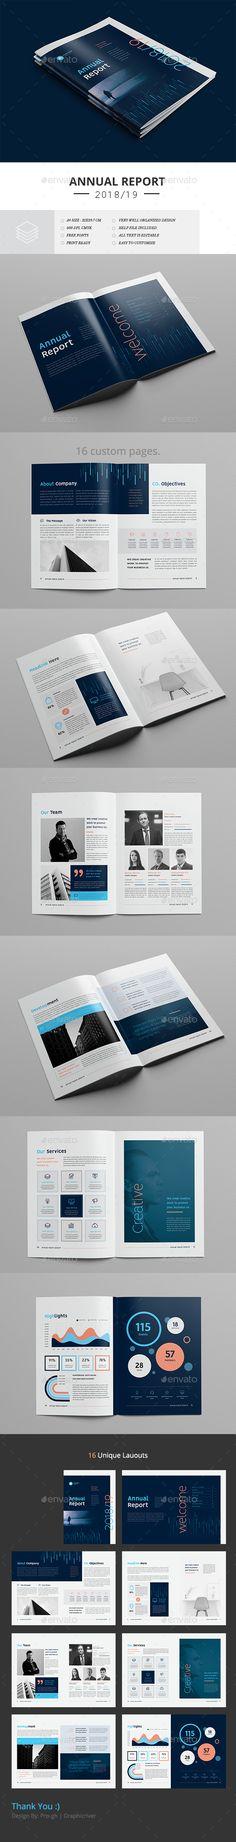 Annual Report 2018/19 - Corporate Brochures